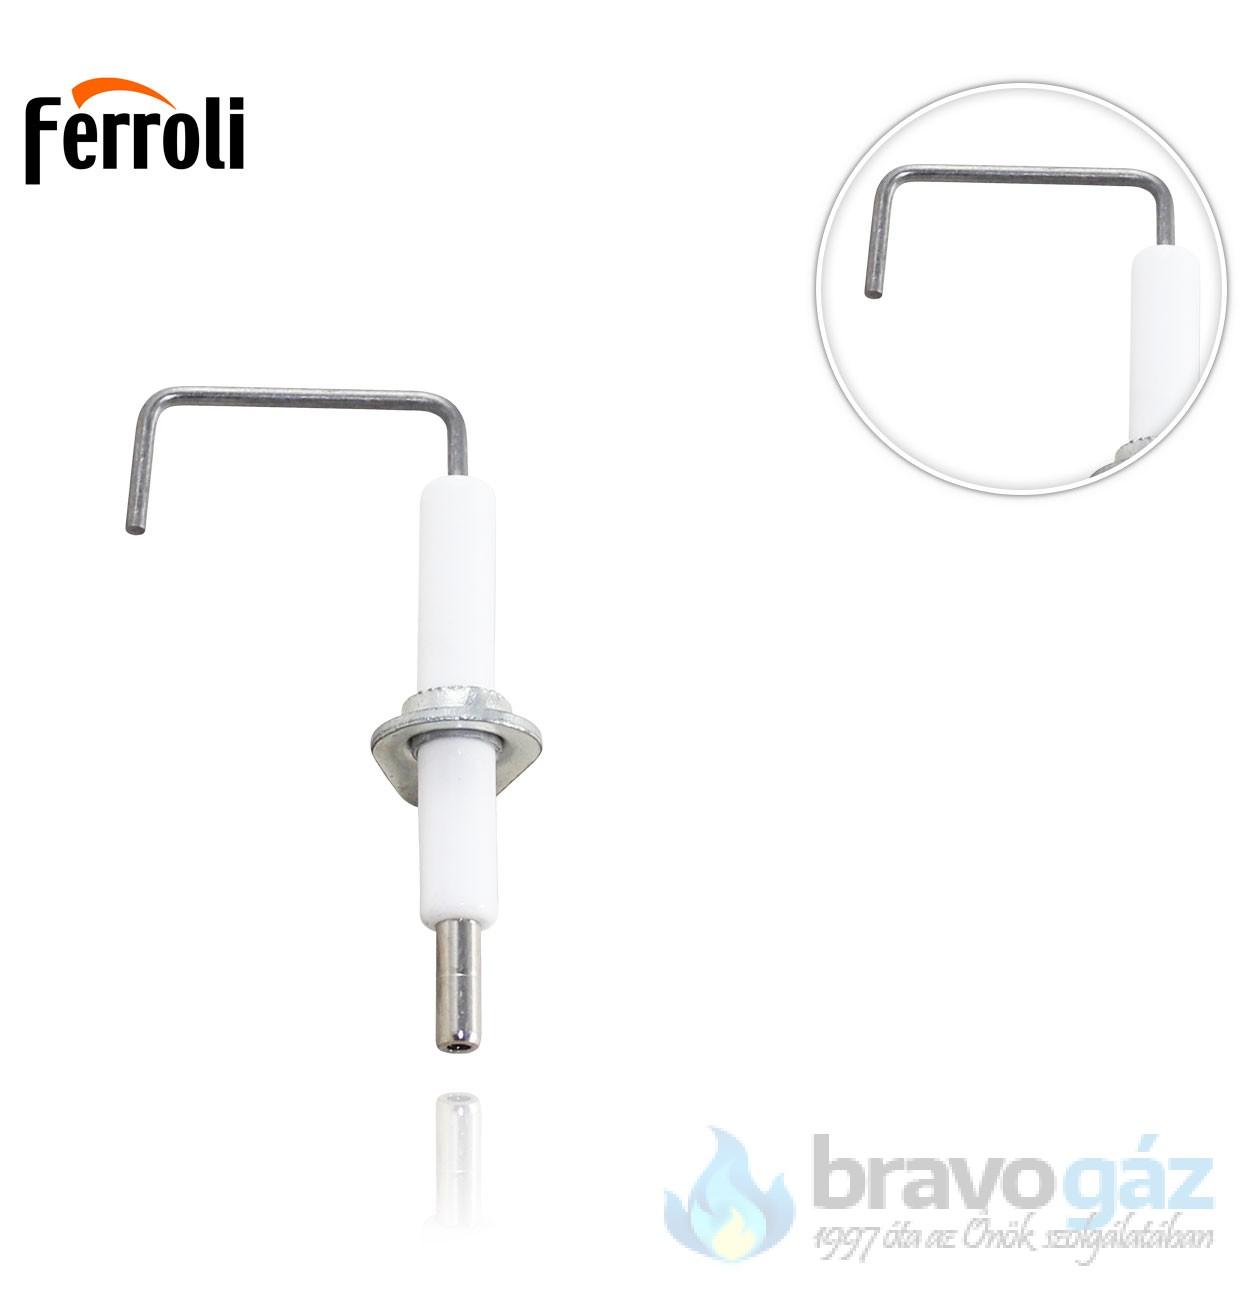 Ferroli gyújtó elektróda